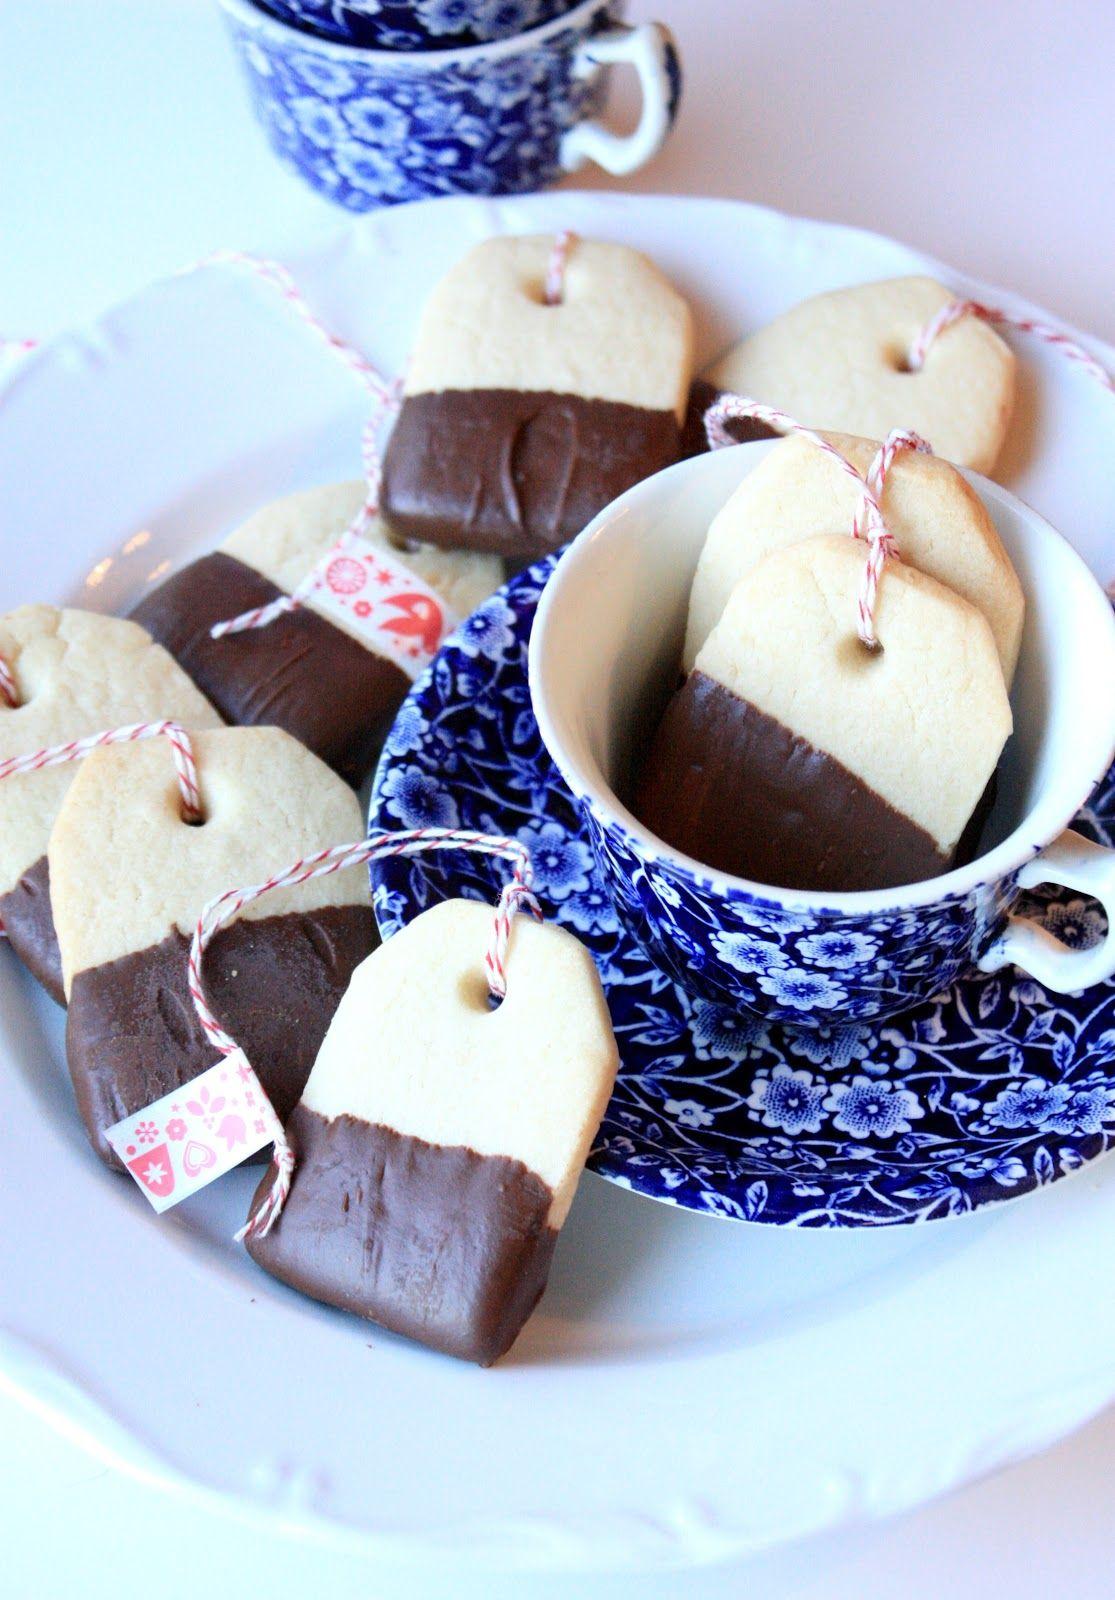 Munchkin Munchies: Tea Bag Cookies